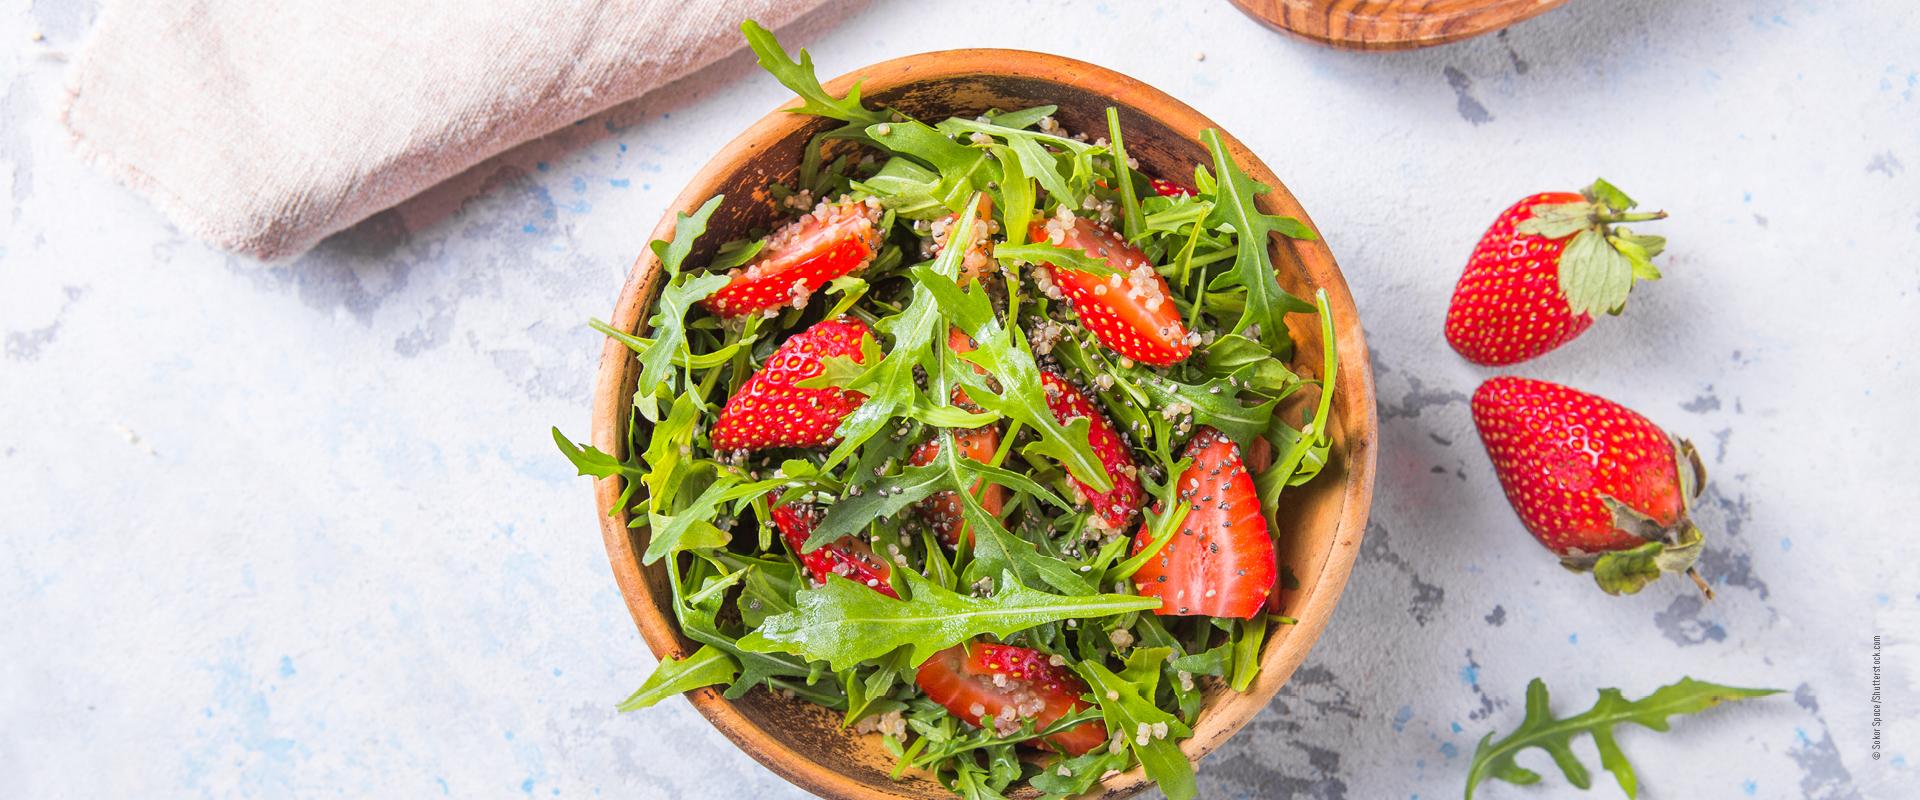 Erdbeer-Rucola Salat_Grillbeilagen